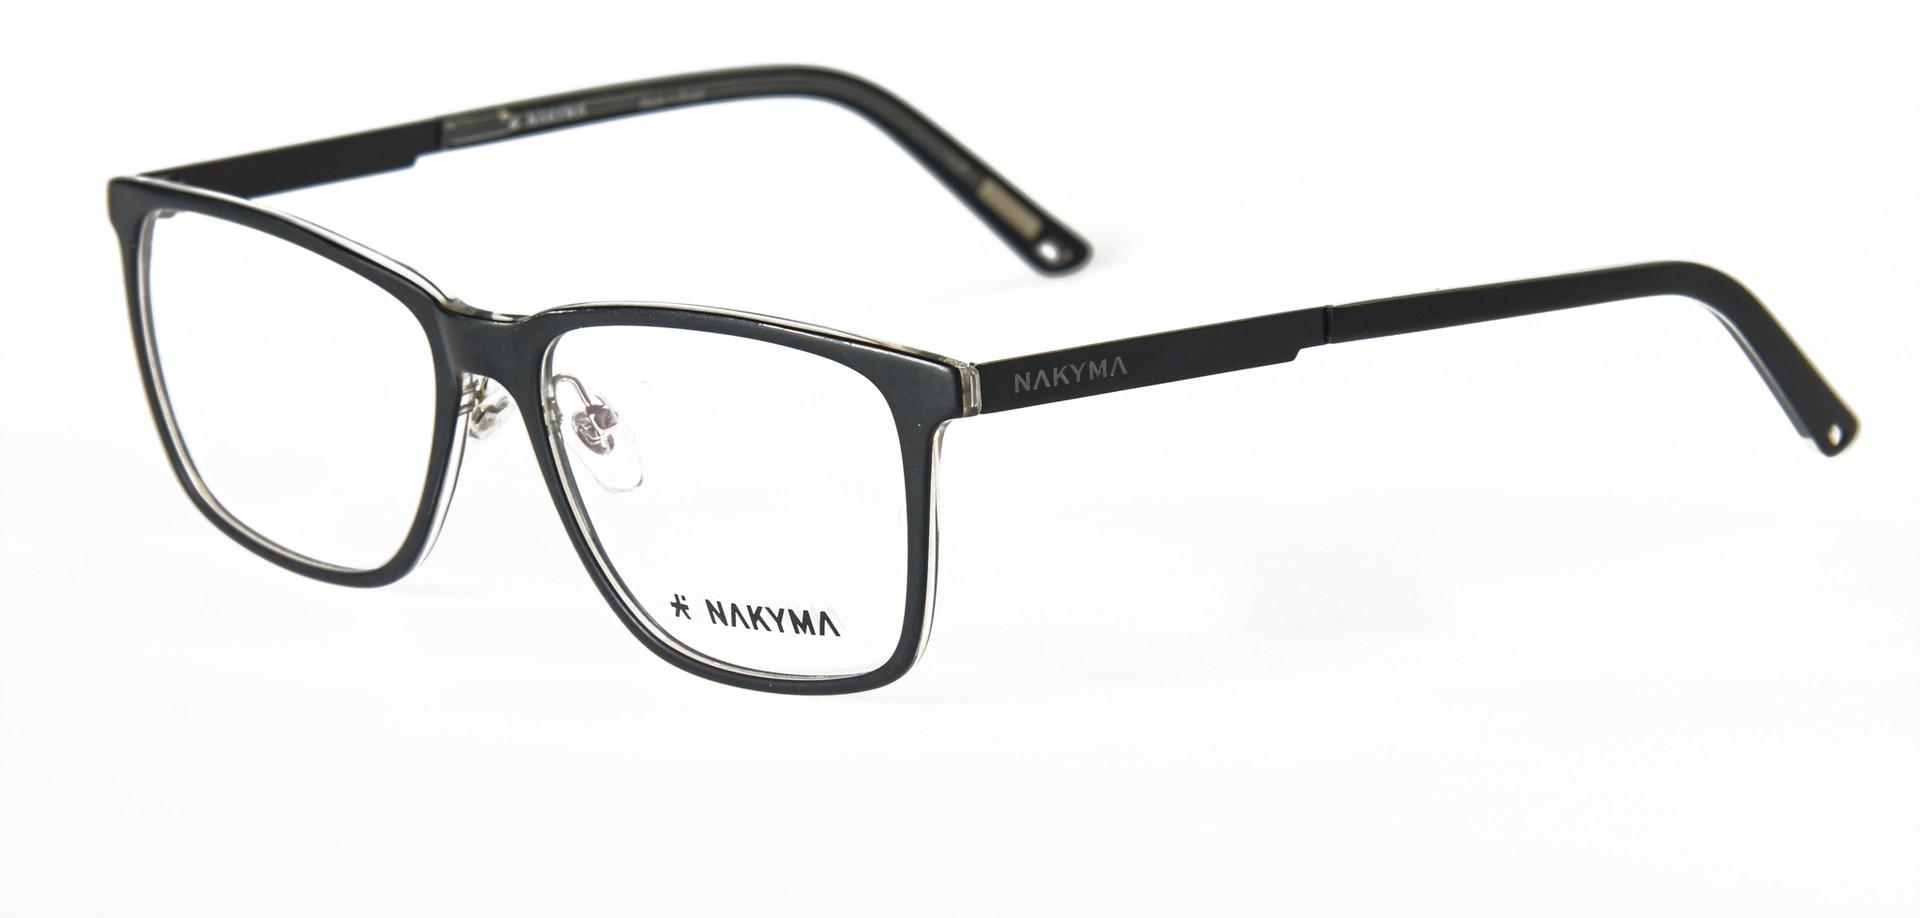 8R1-NAKYMA-02 C1